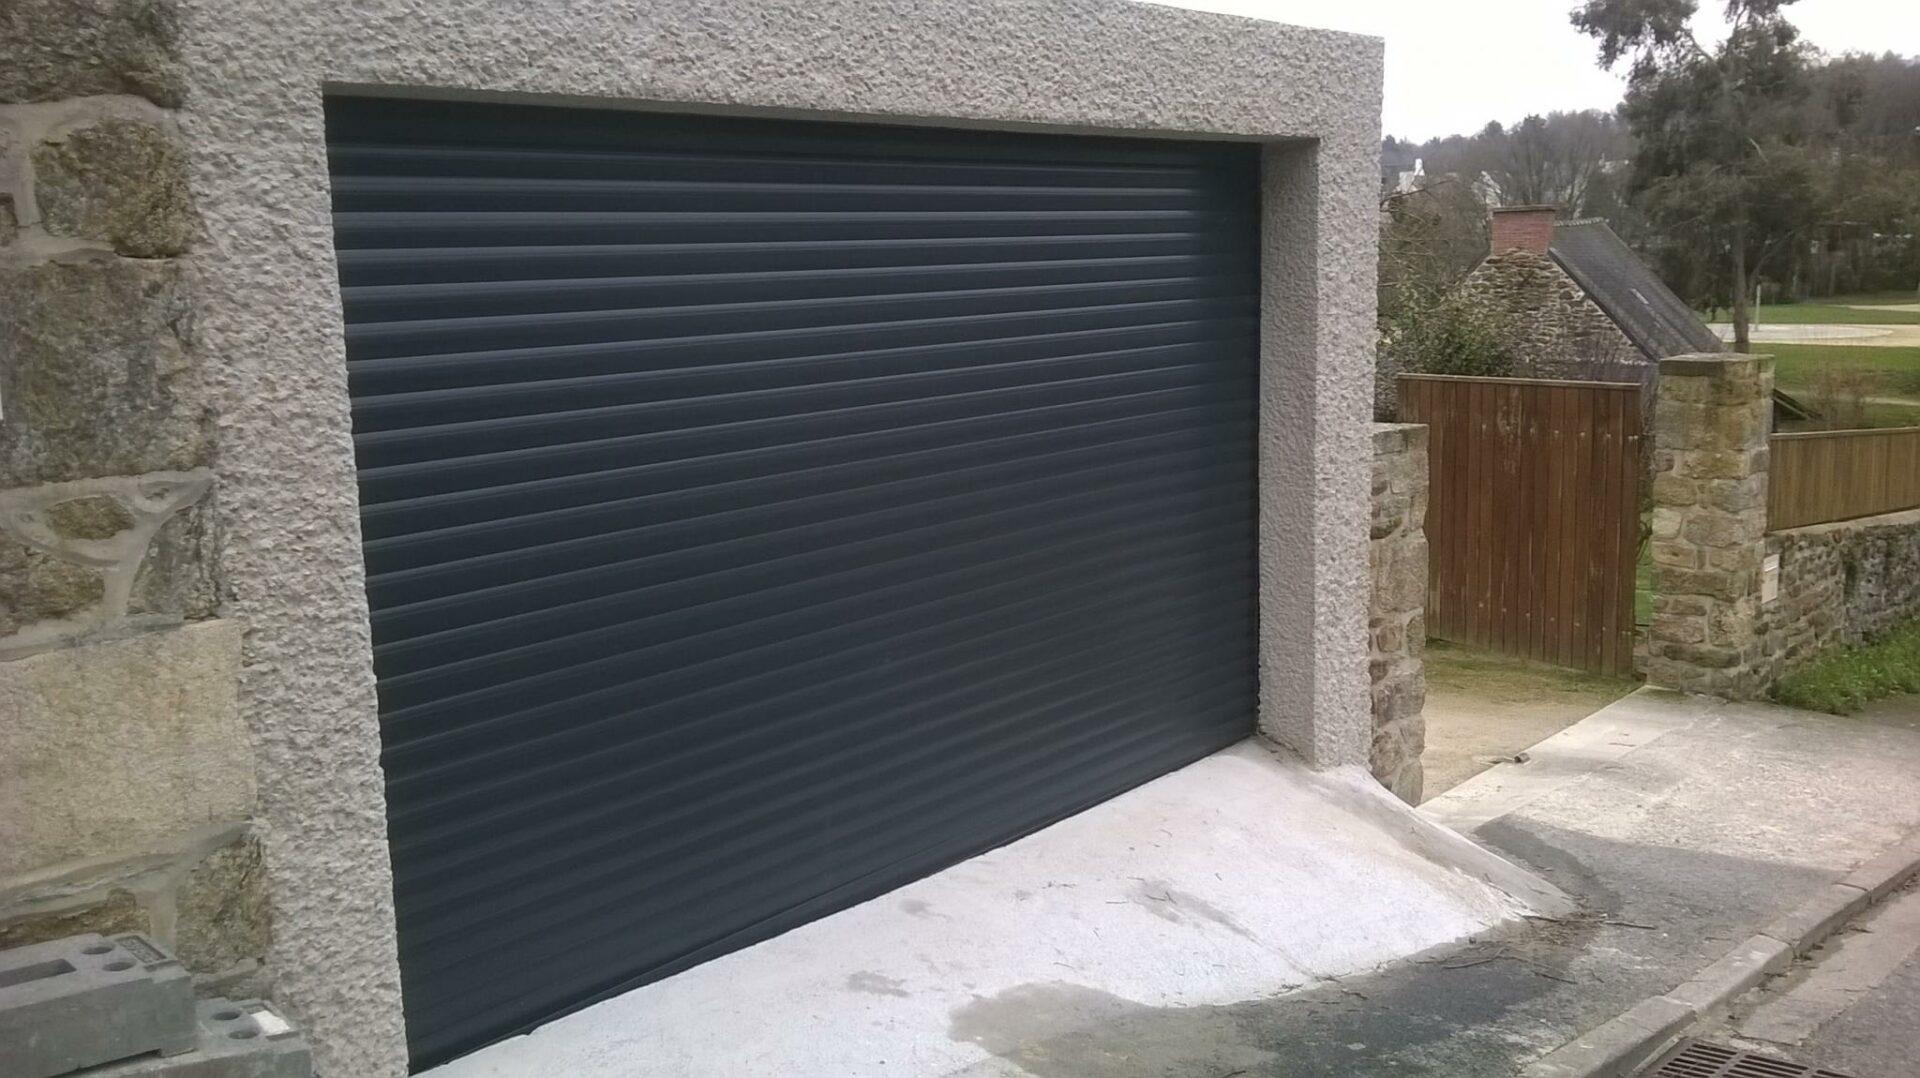 porte garage enroulable - Portes de garage enroulable